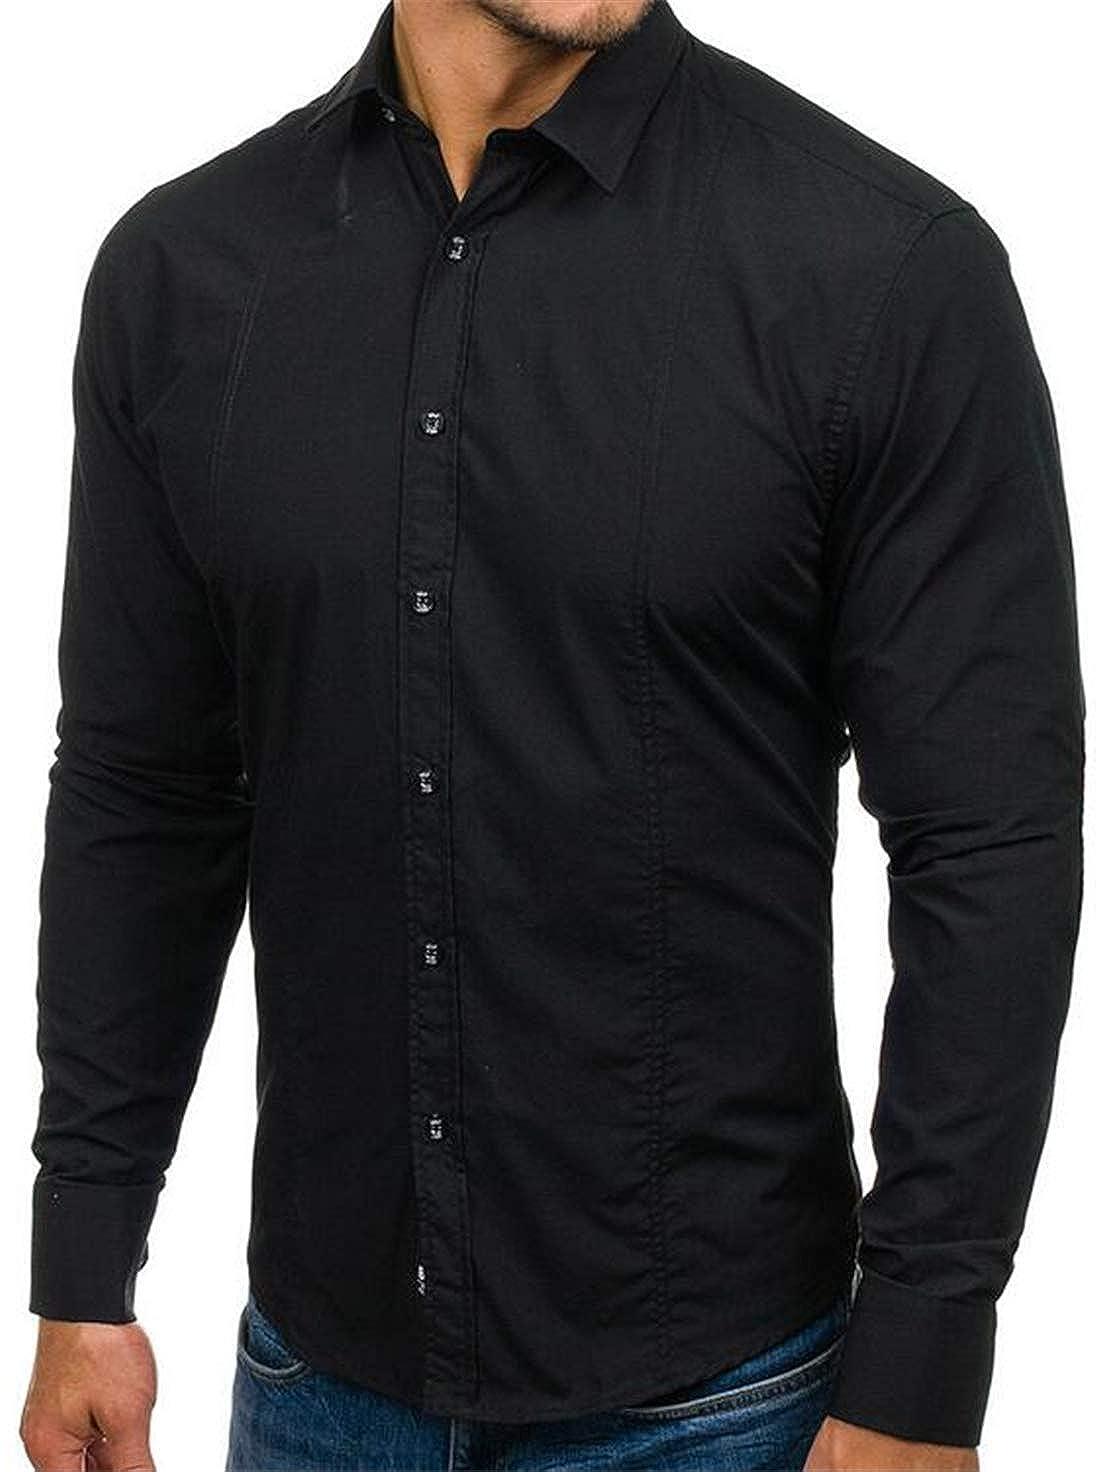 XiaoTianXinMen XTX Mens Casual Regular Fit Cotton Long Sleeve Button Up Solid Dress Shirts